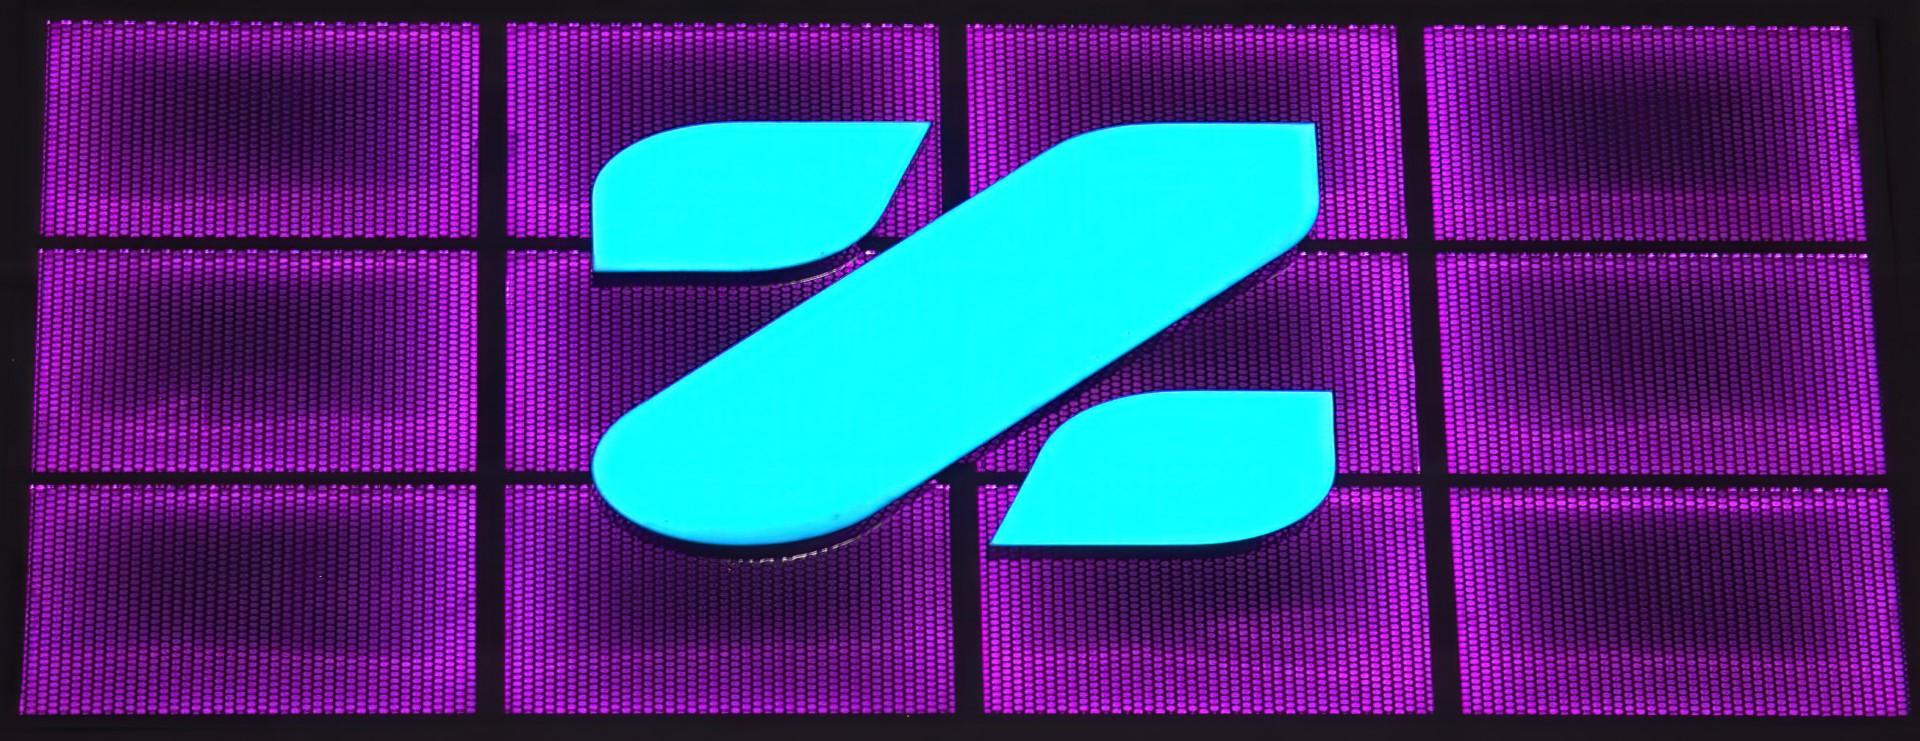 Zupps box - Siganto Drive PINK - Blue Z 1920x741